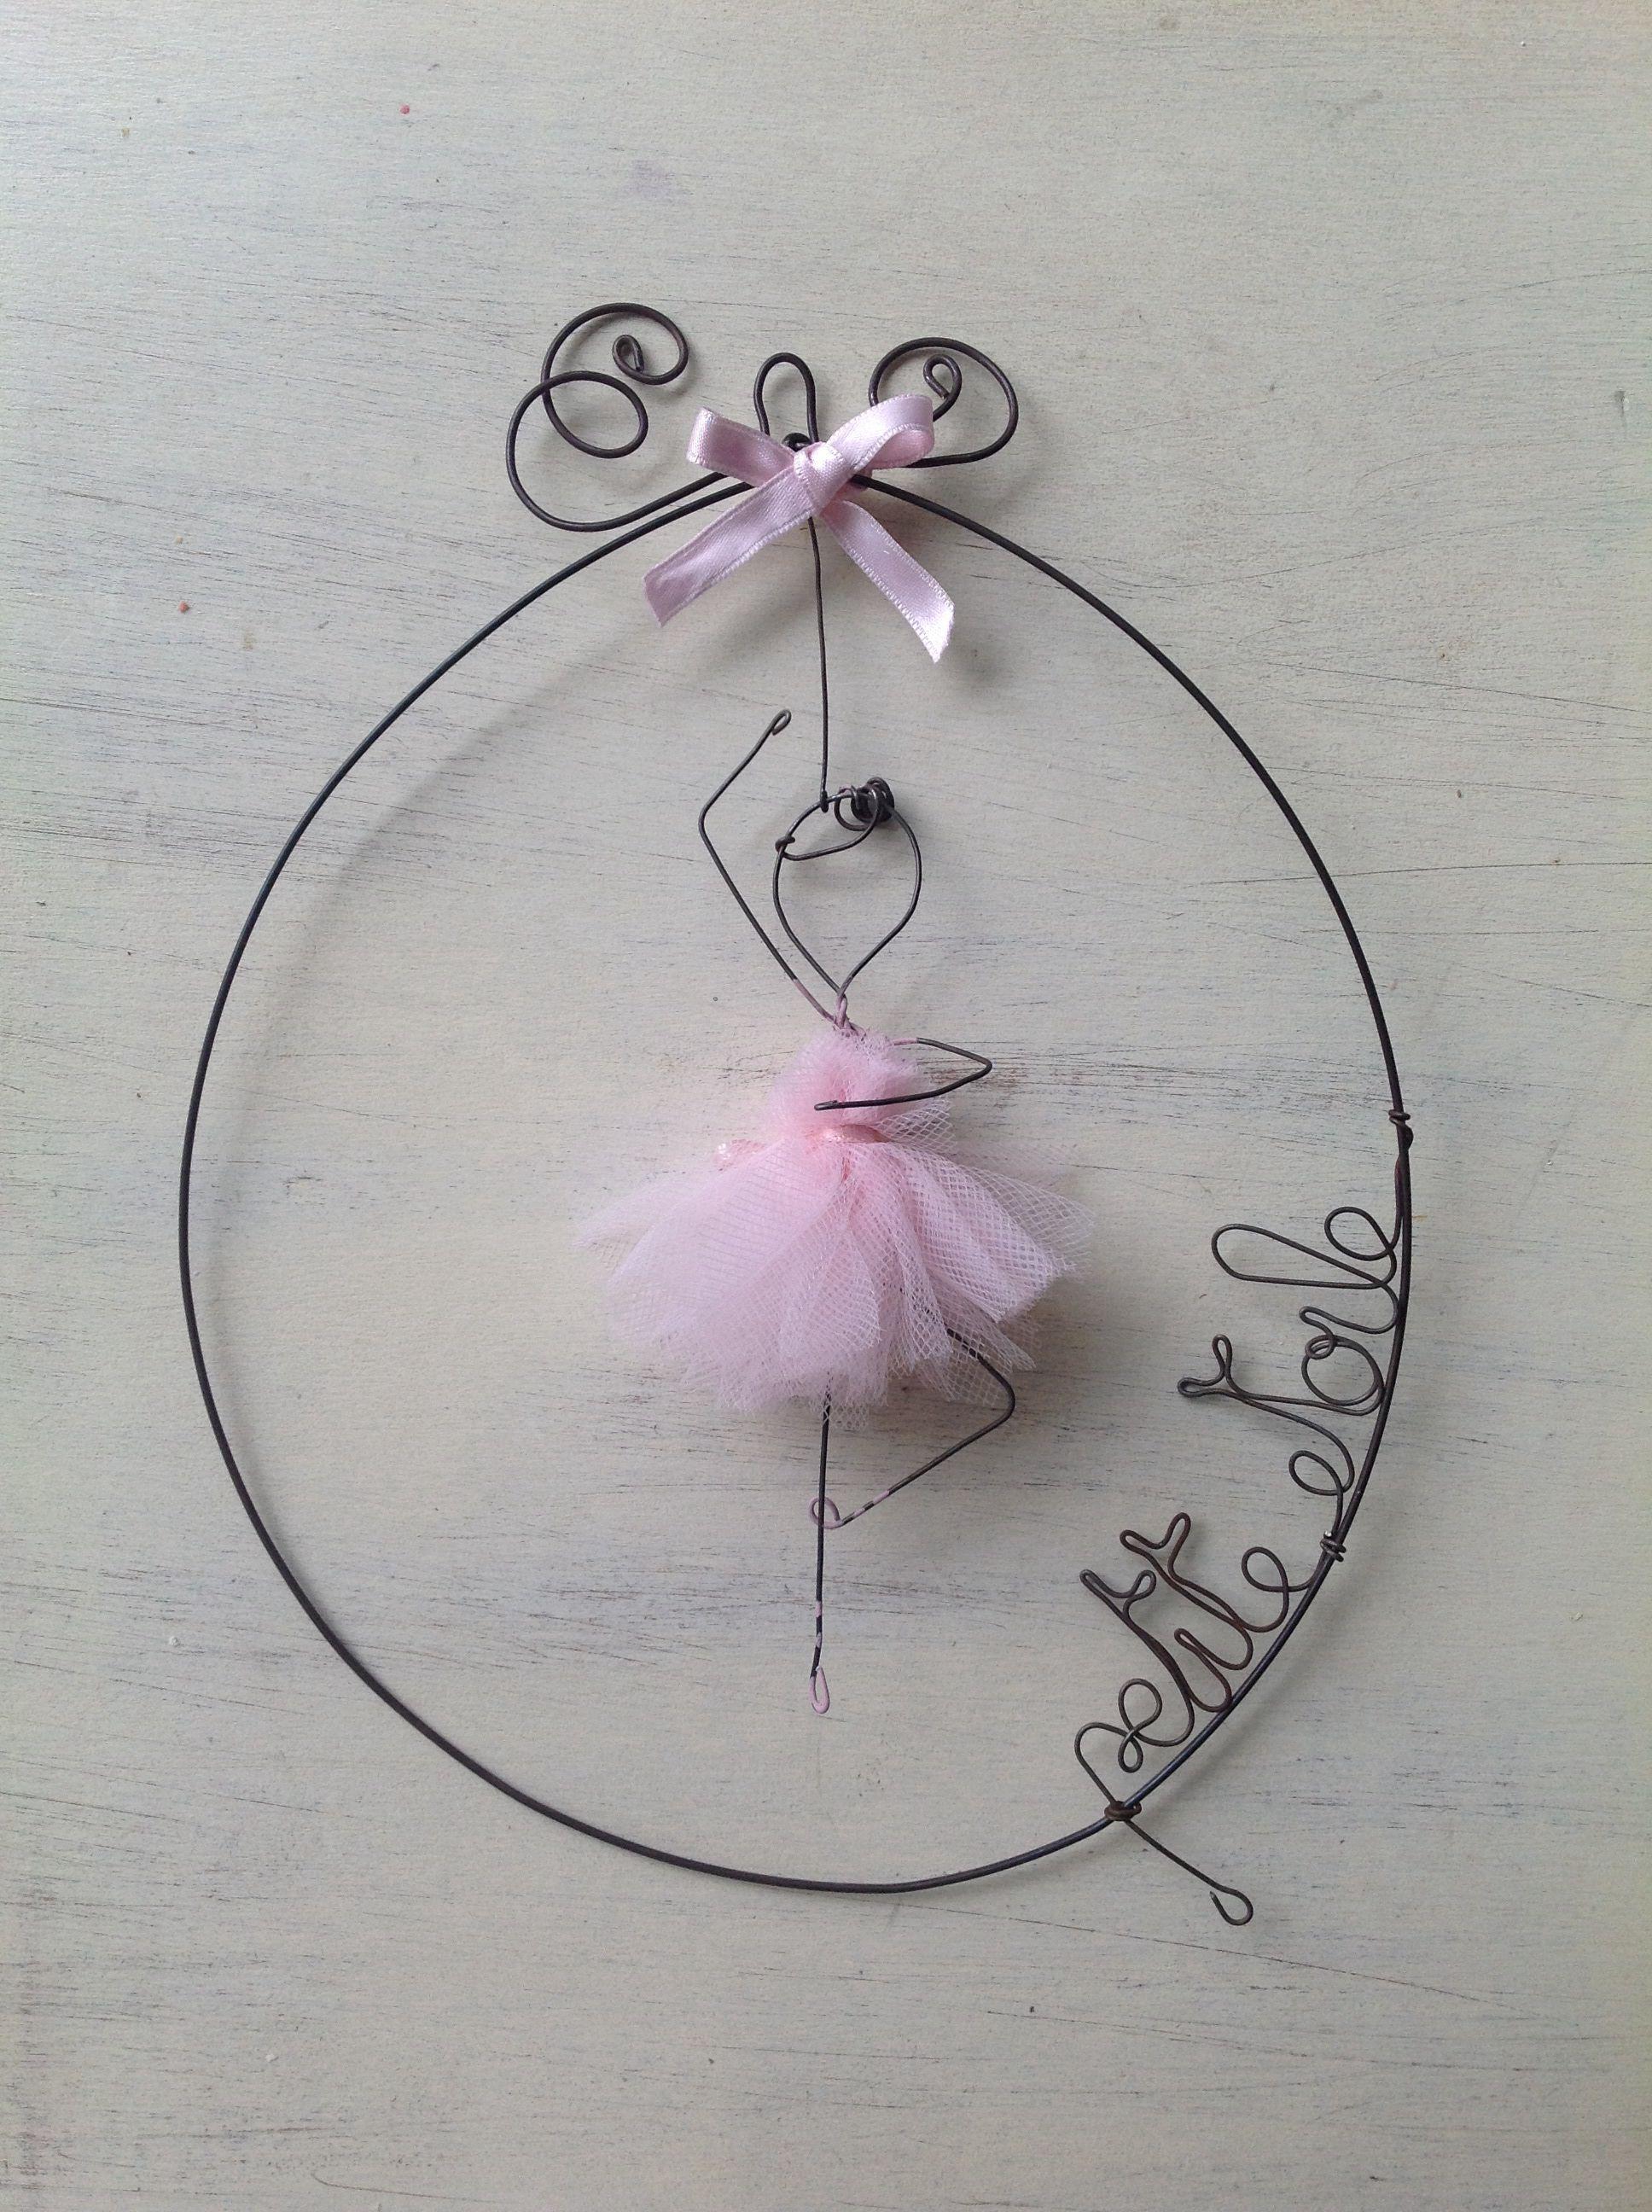 Pink ballerina wire art fil di ferro | craft projects | Pinterest ...